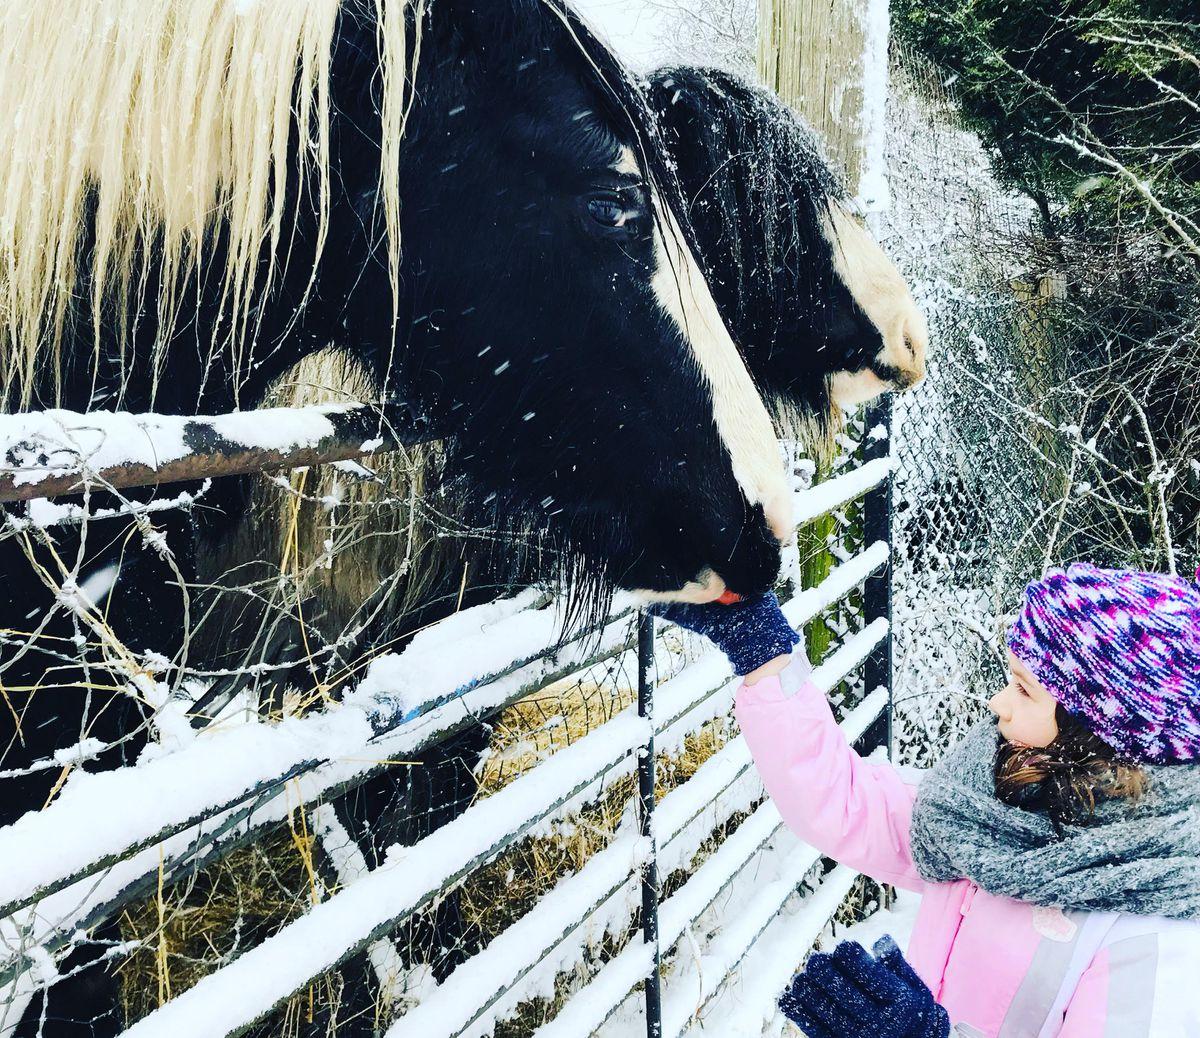 Feeding horses Pic: Elena Suciu